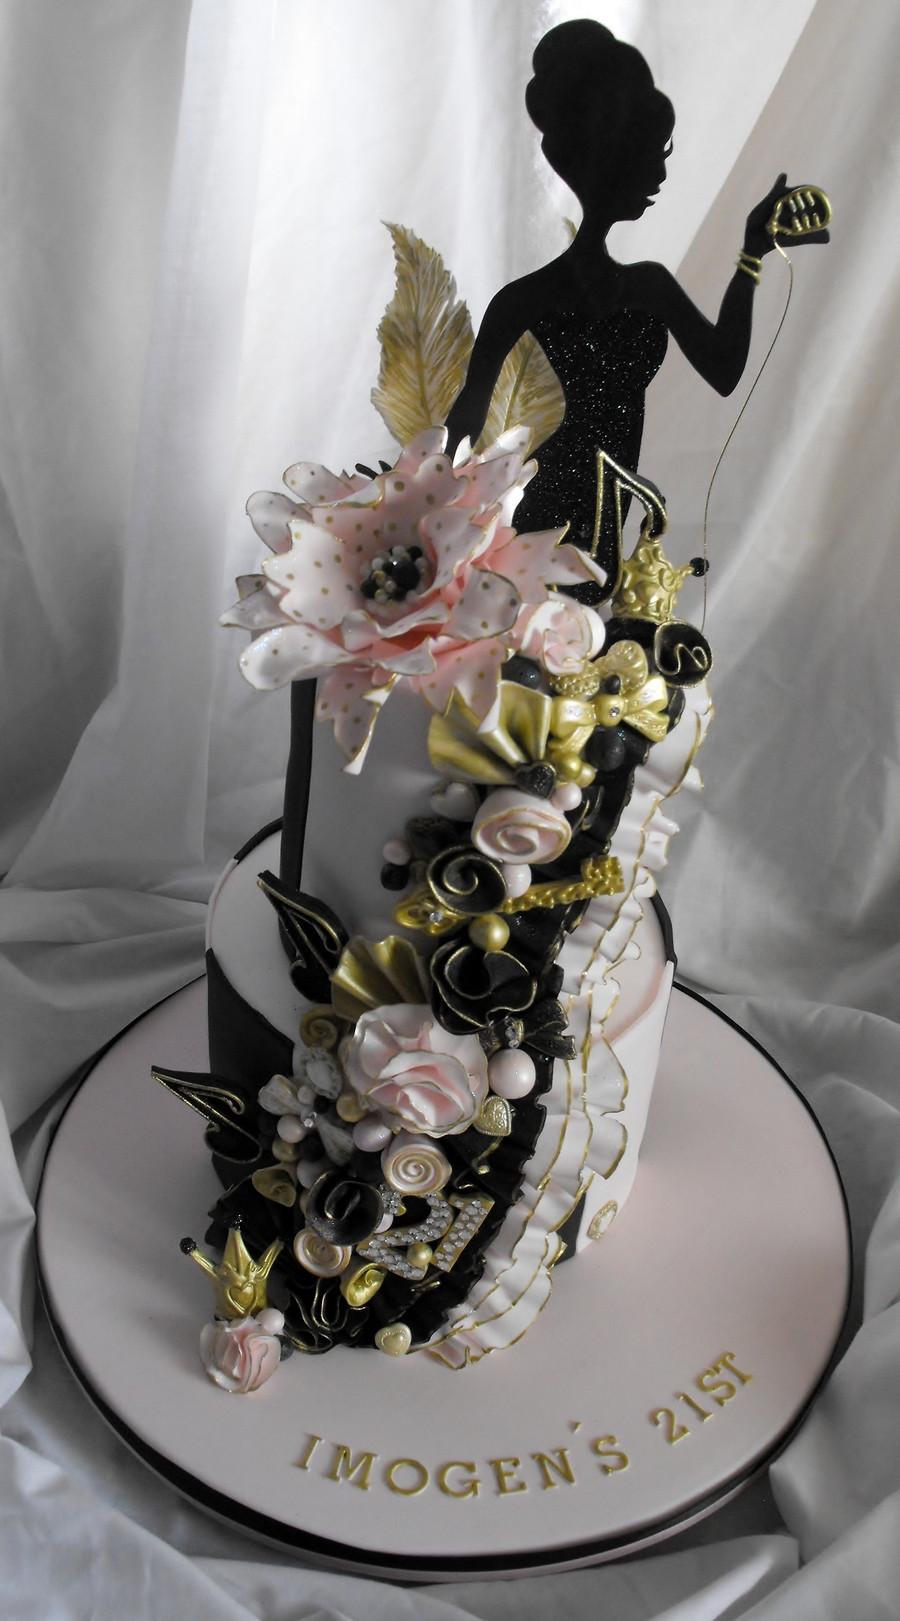 21St Birthday Cake  2 Tier Pink Black And Gold 21St Birthday Cake